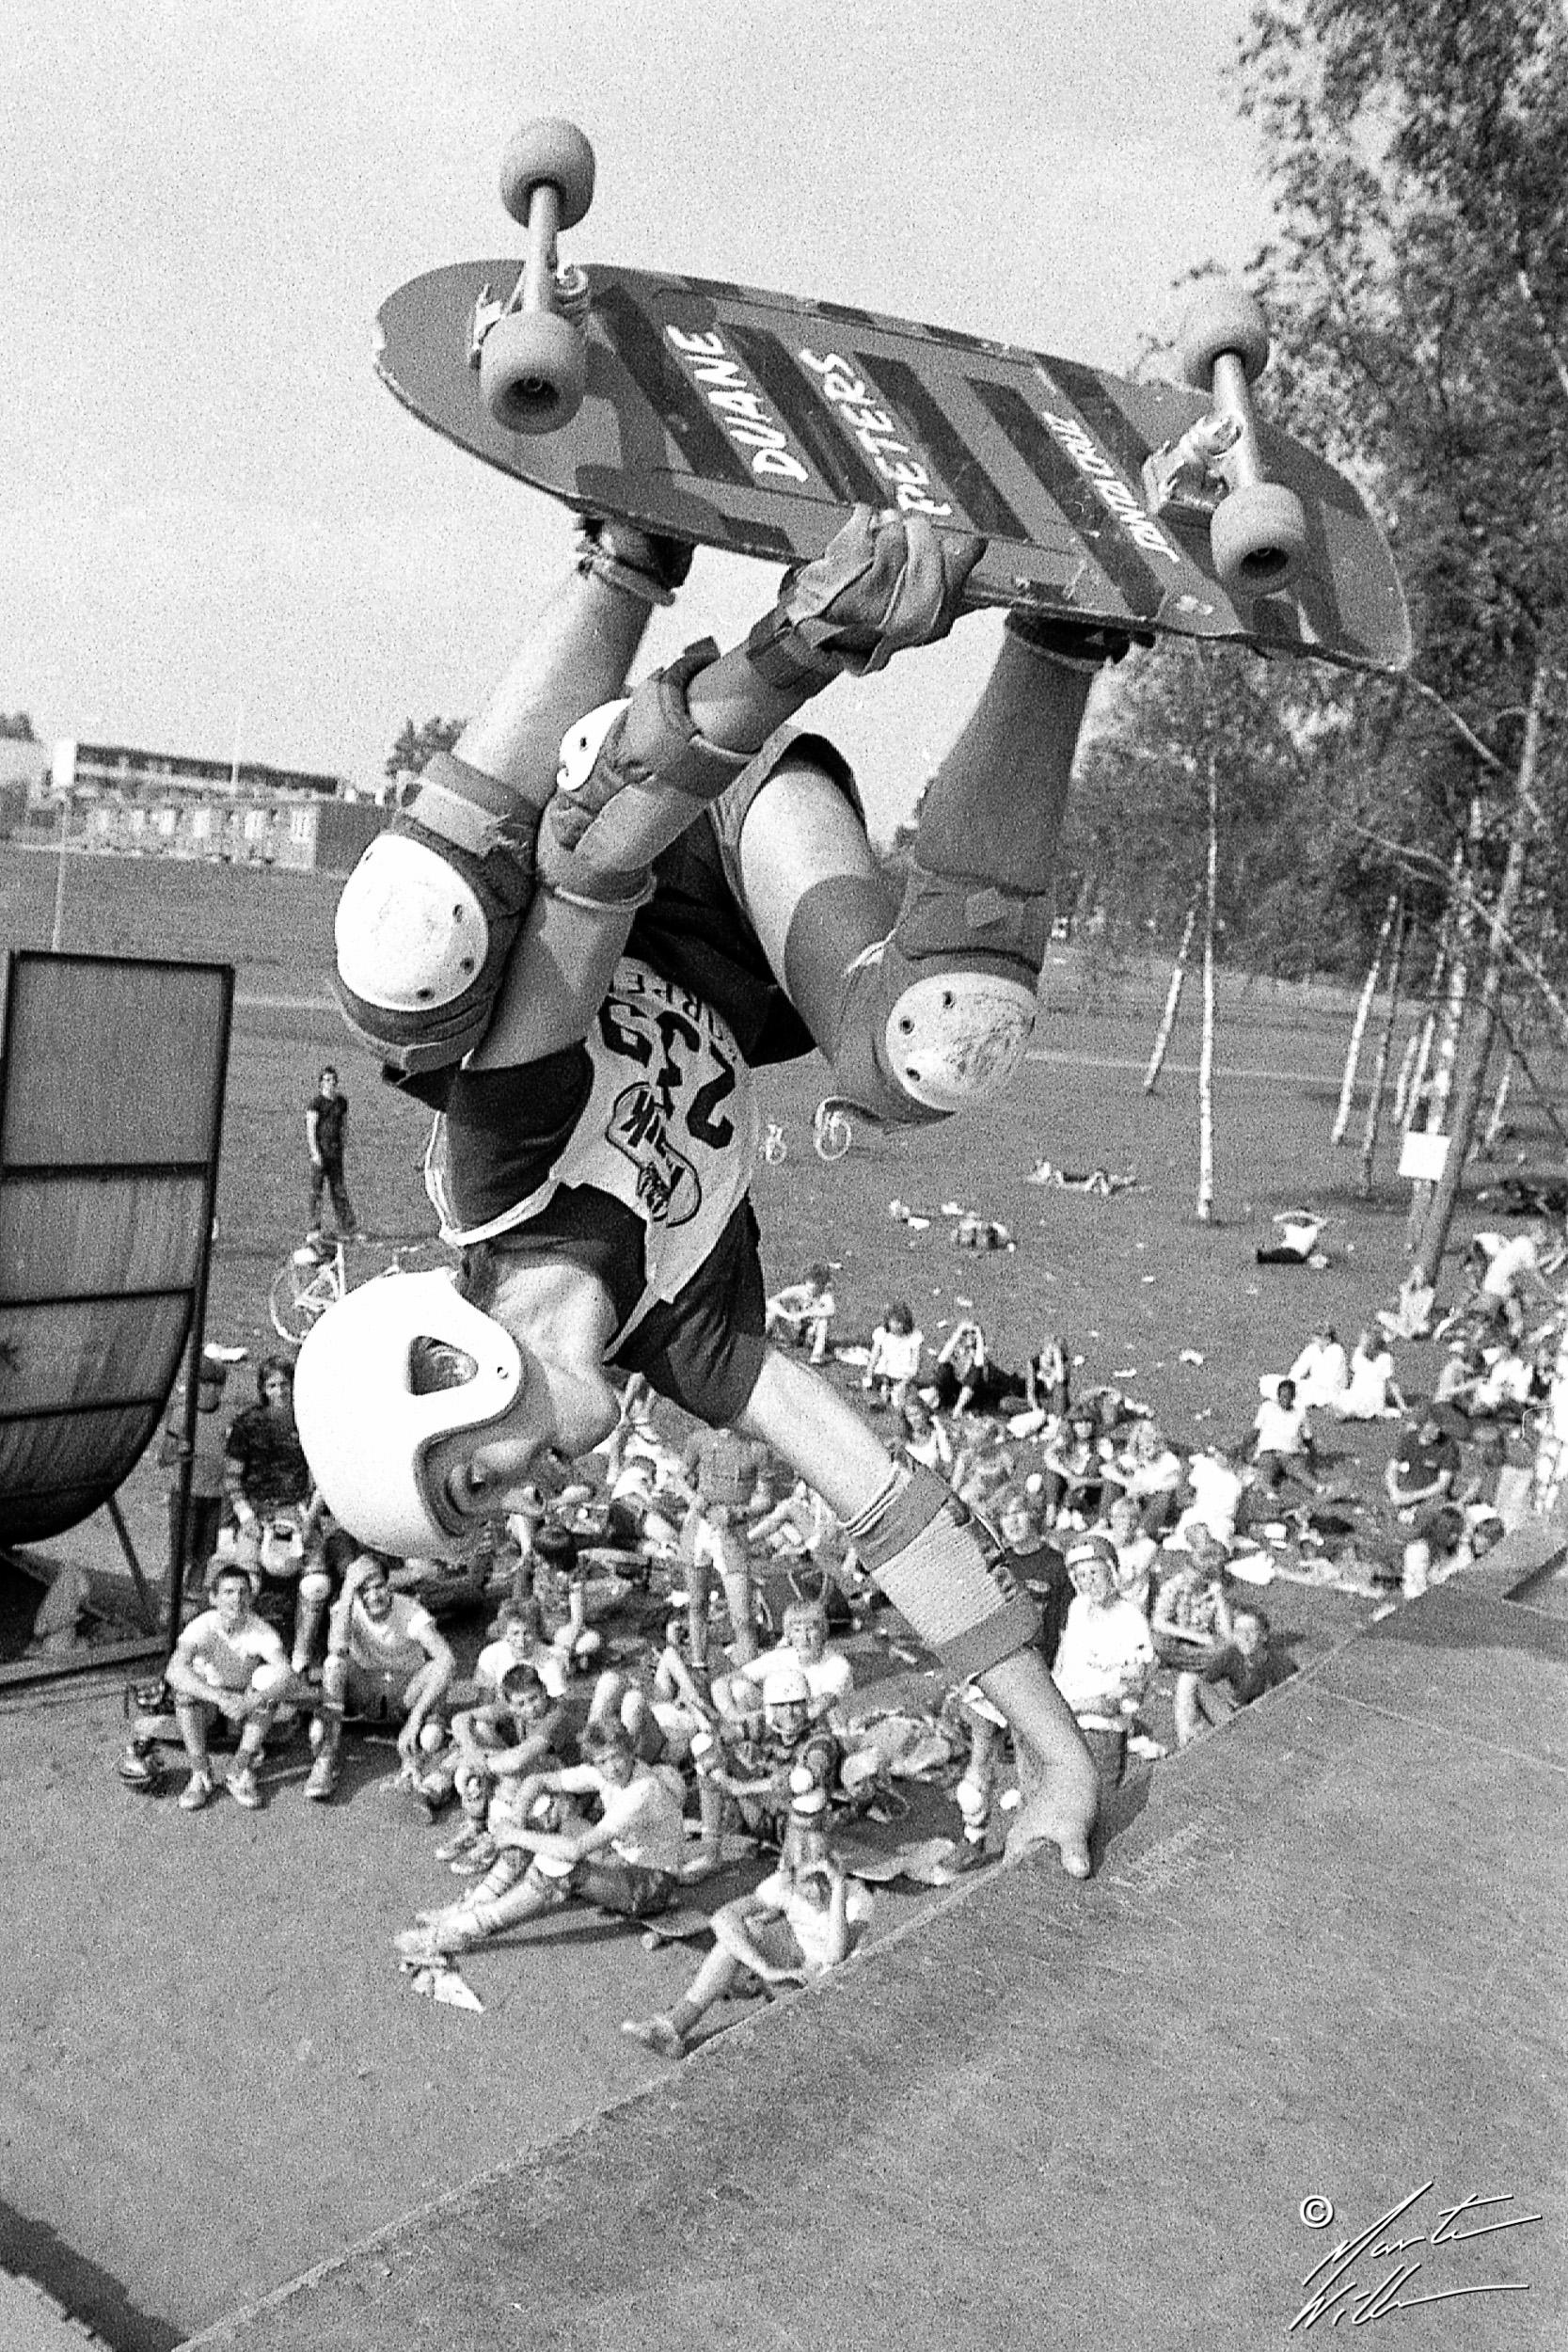 Patric Backlund, Handplant, Sverigecupen, Växjö, 1981